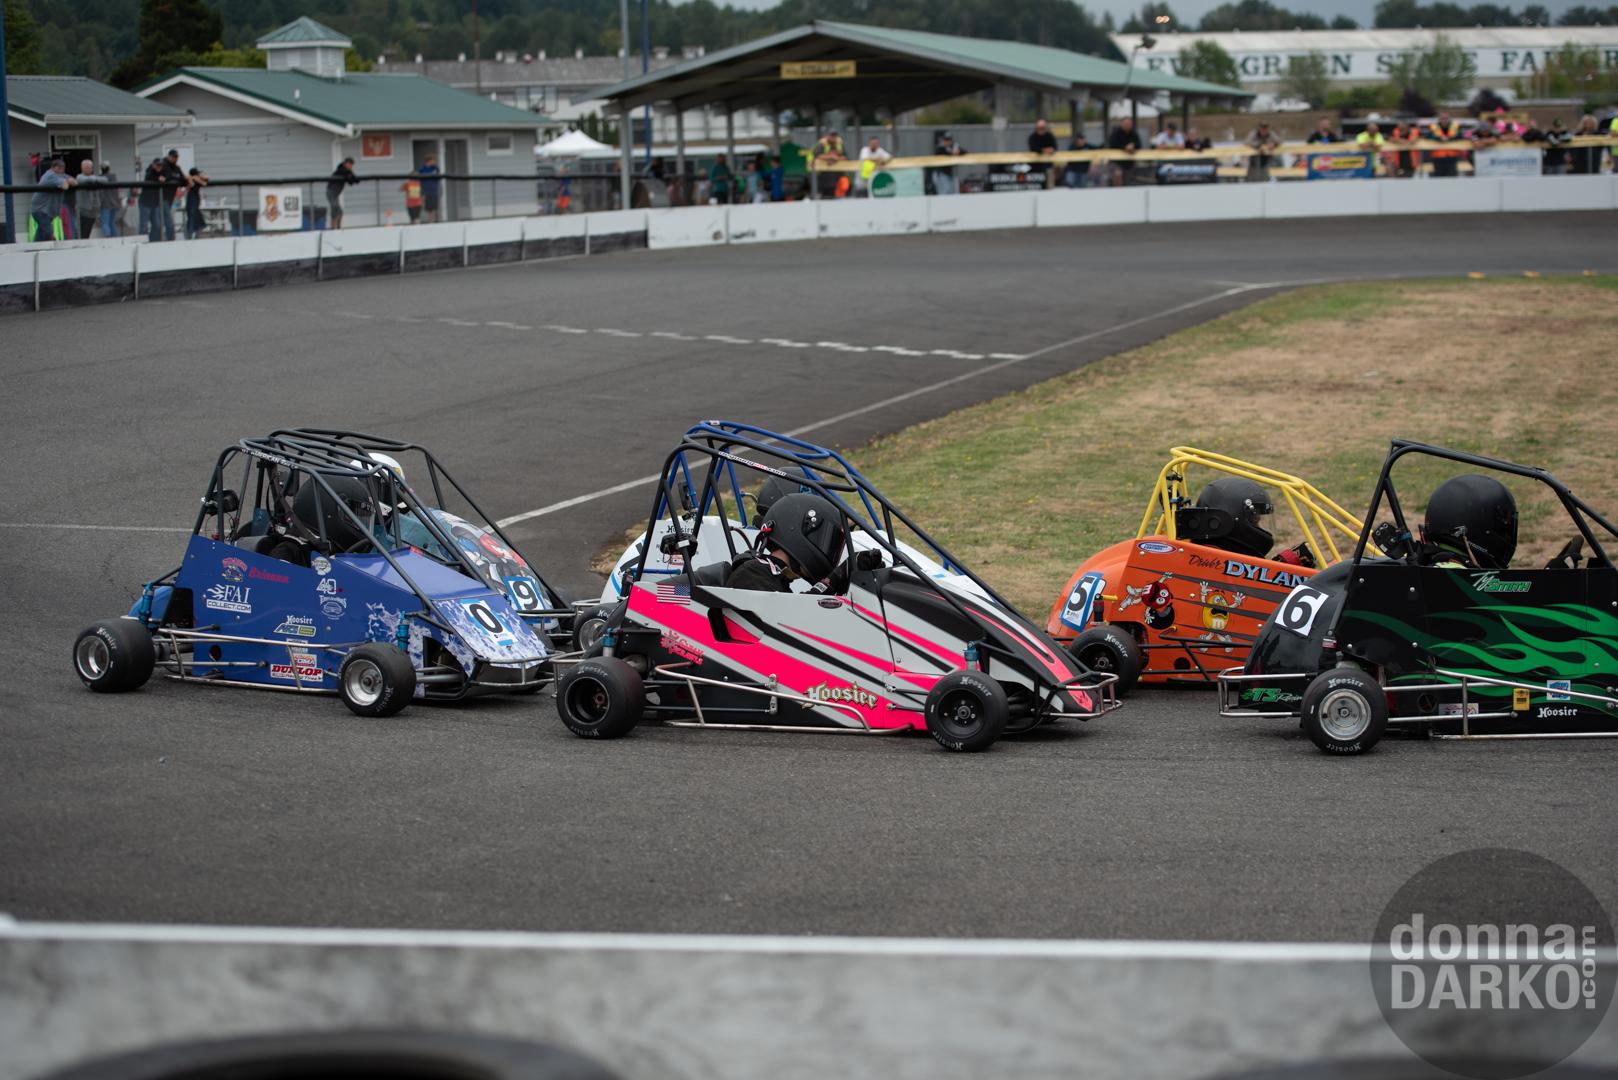 QWMA (Racing) 8-11-2019 DSC_6367.jpg